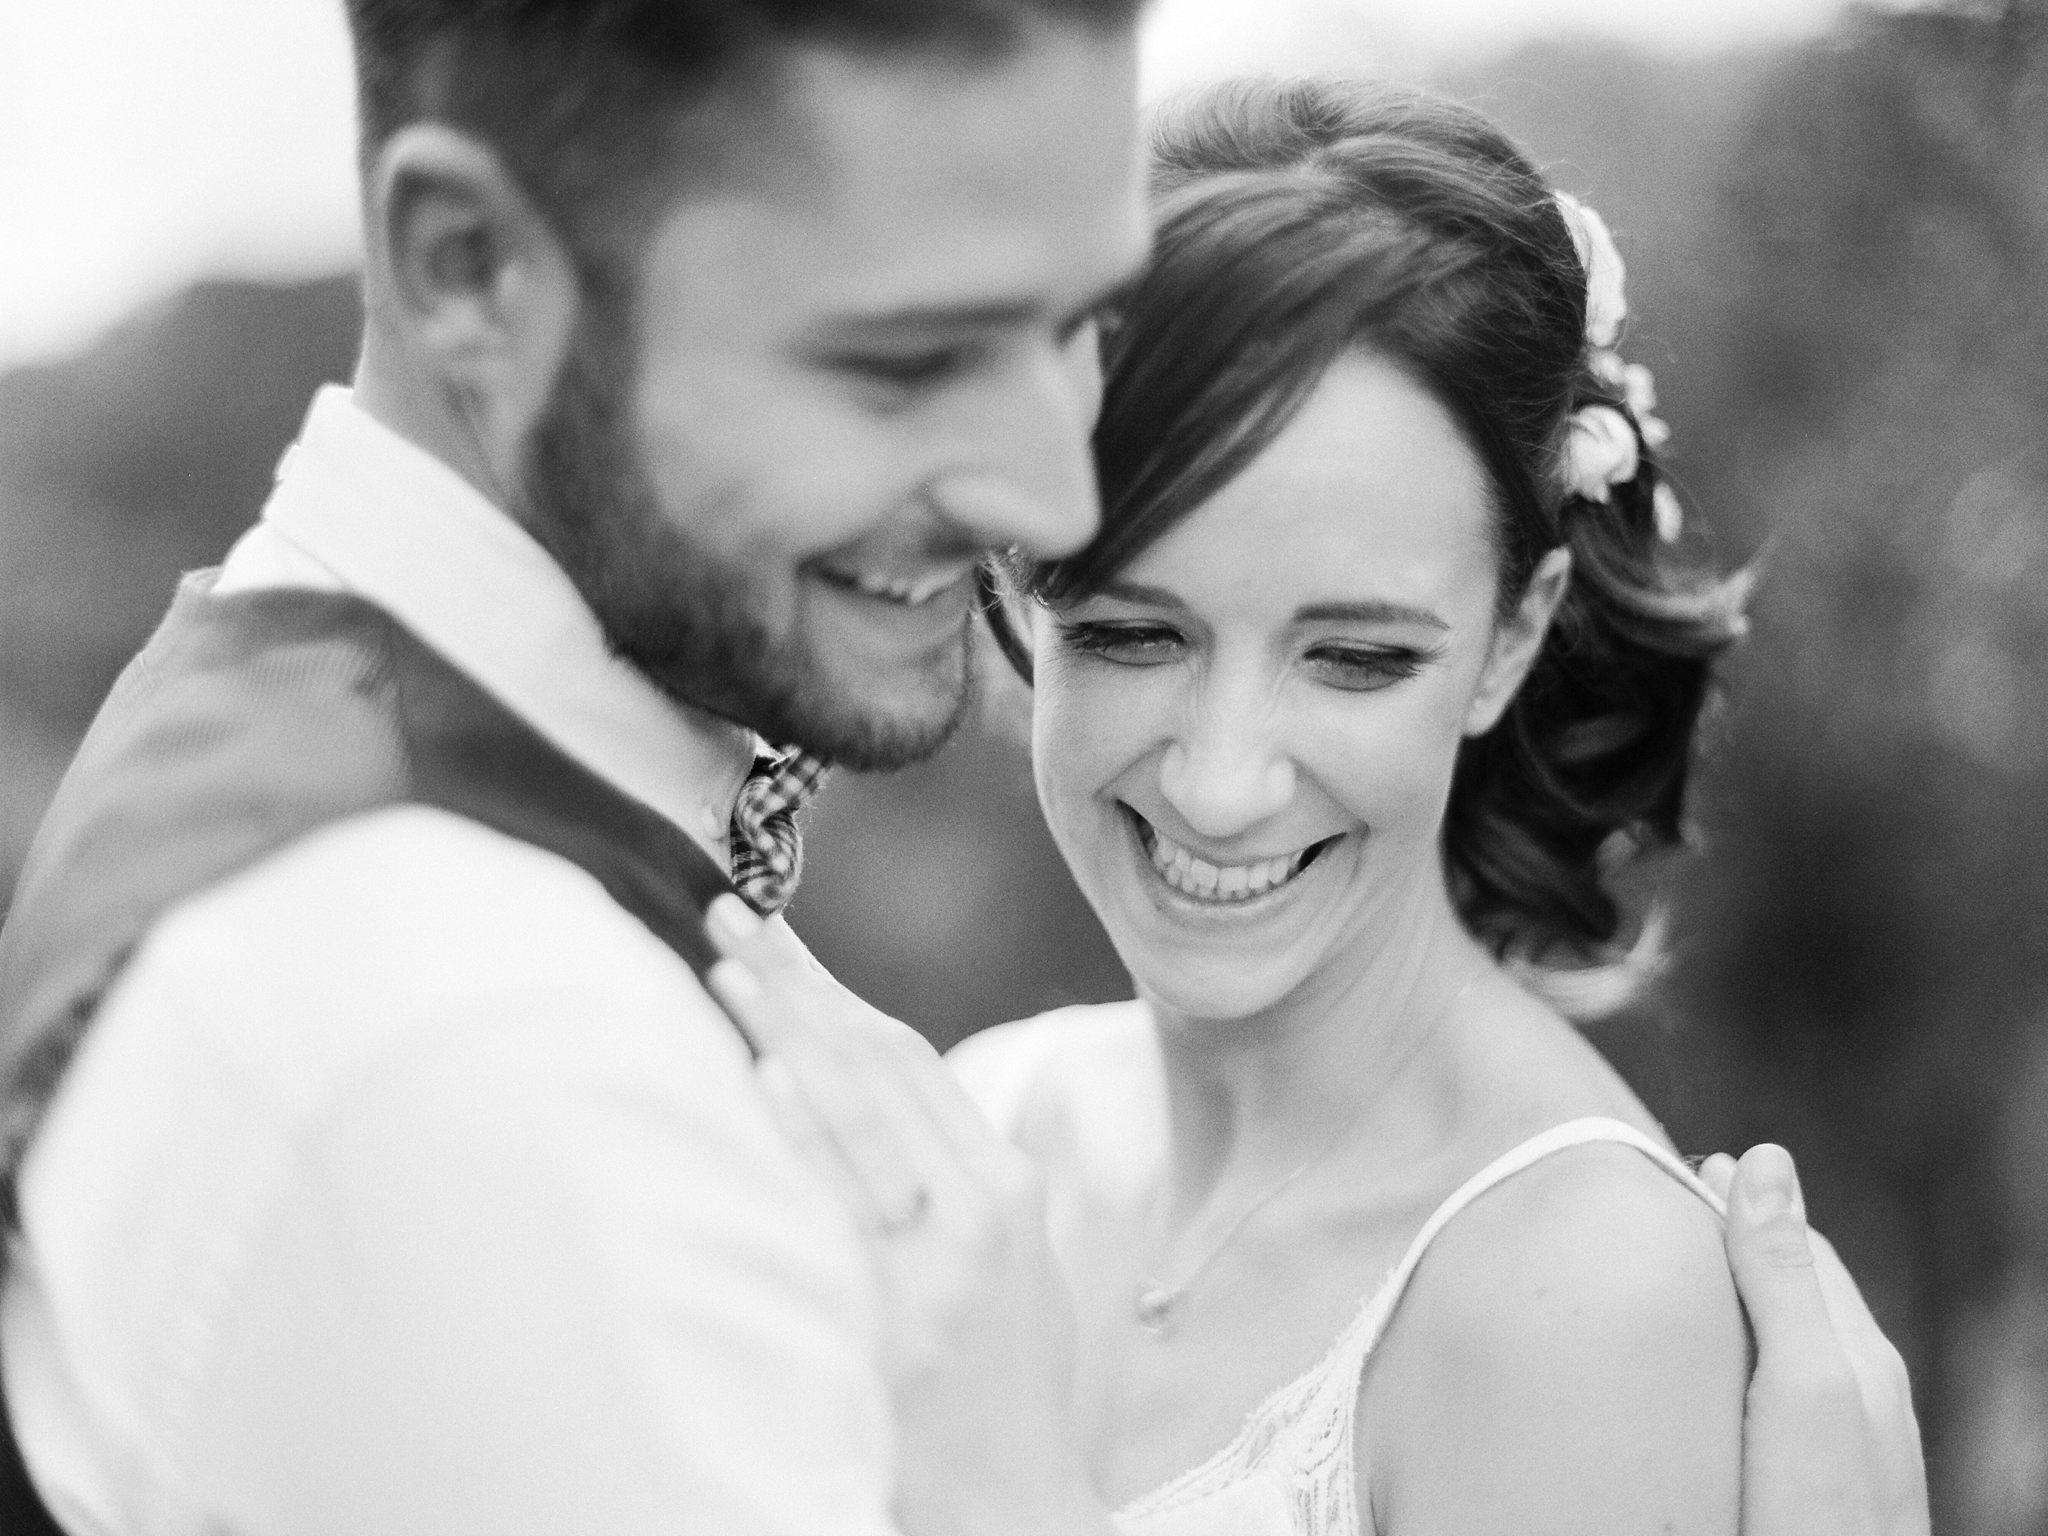 Mariage-a-la-maison-secall-hugo-hennequin-photographe-mariage-perpignan_0125.jpg